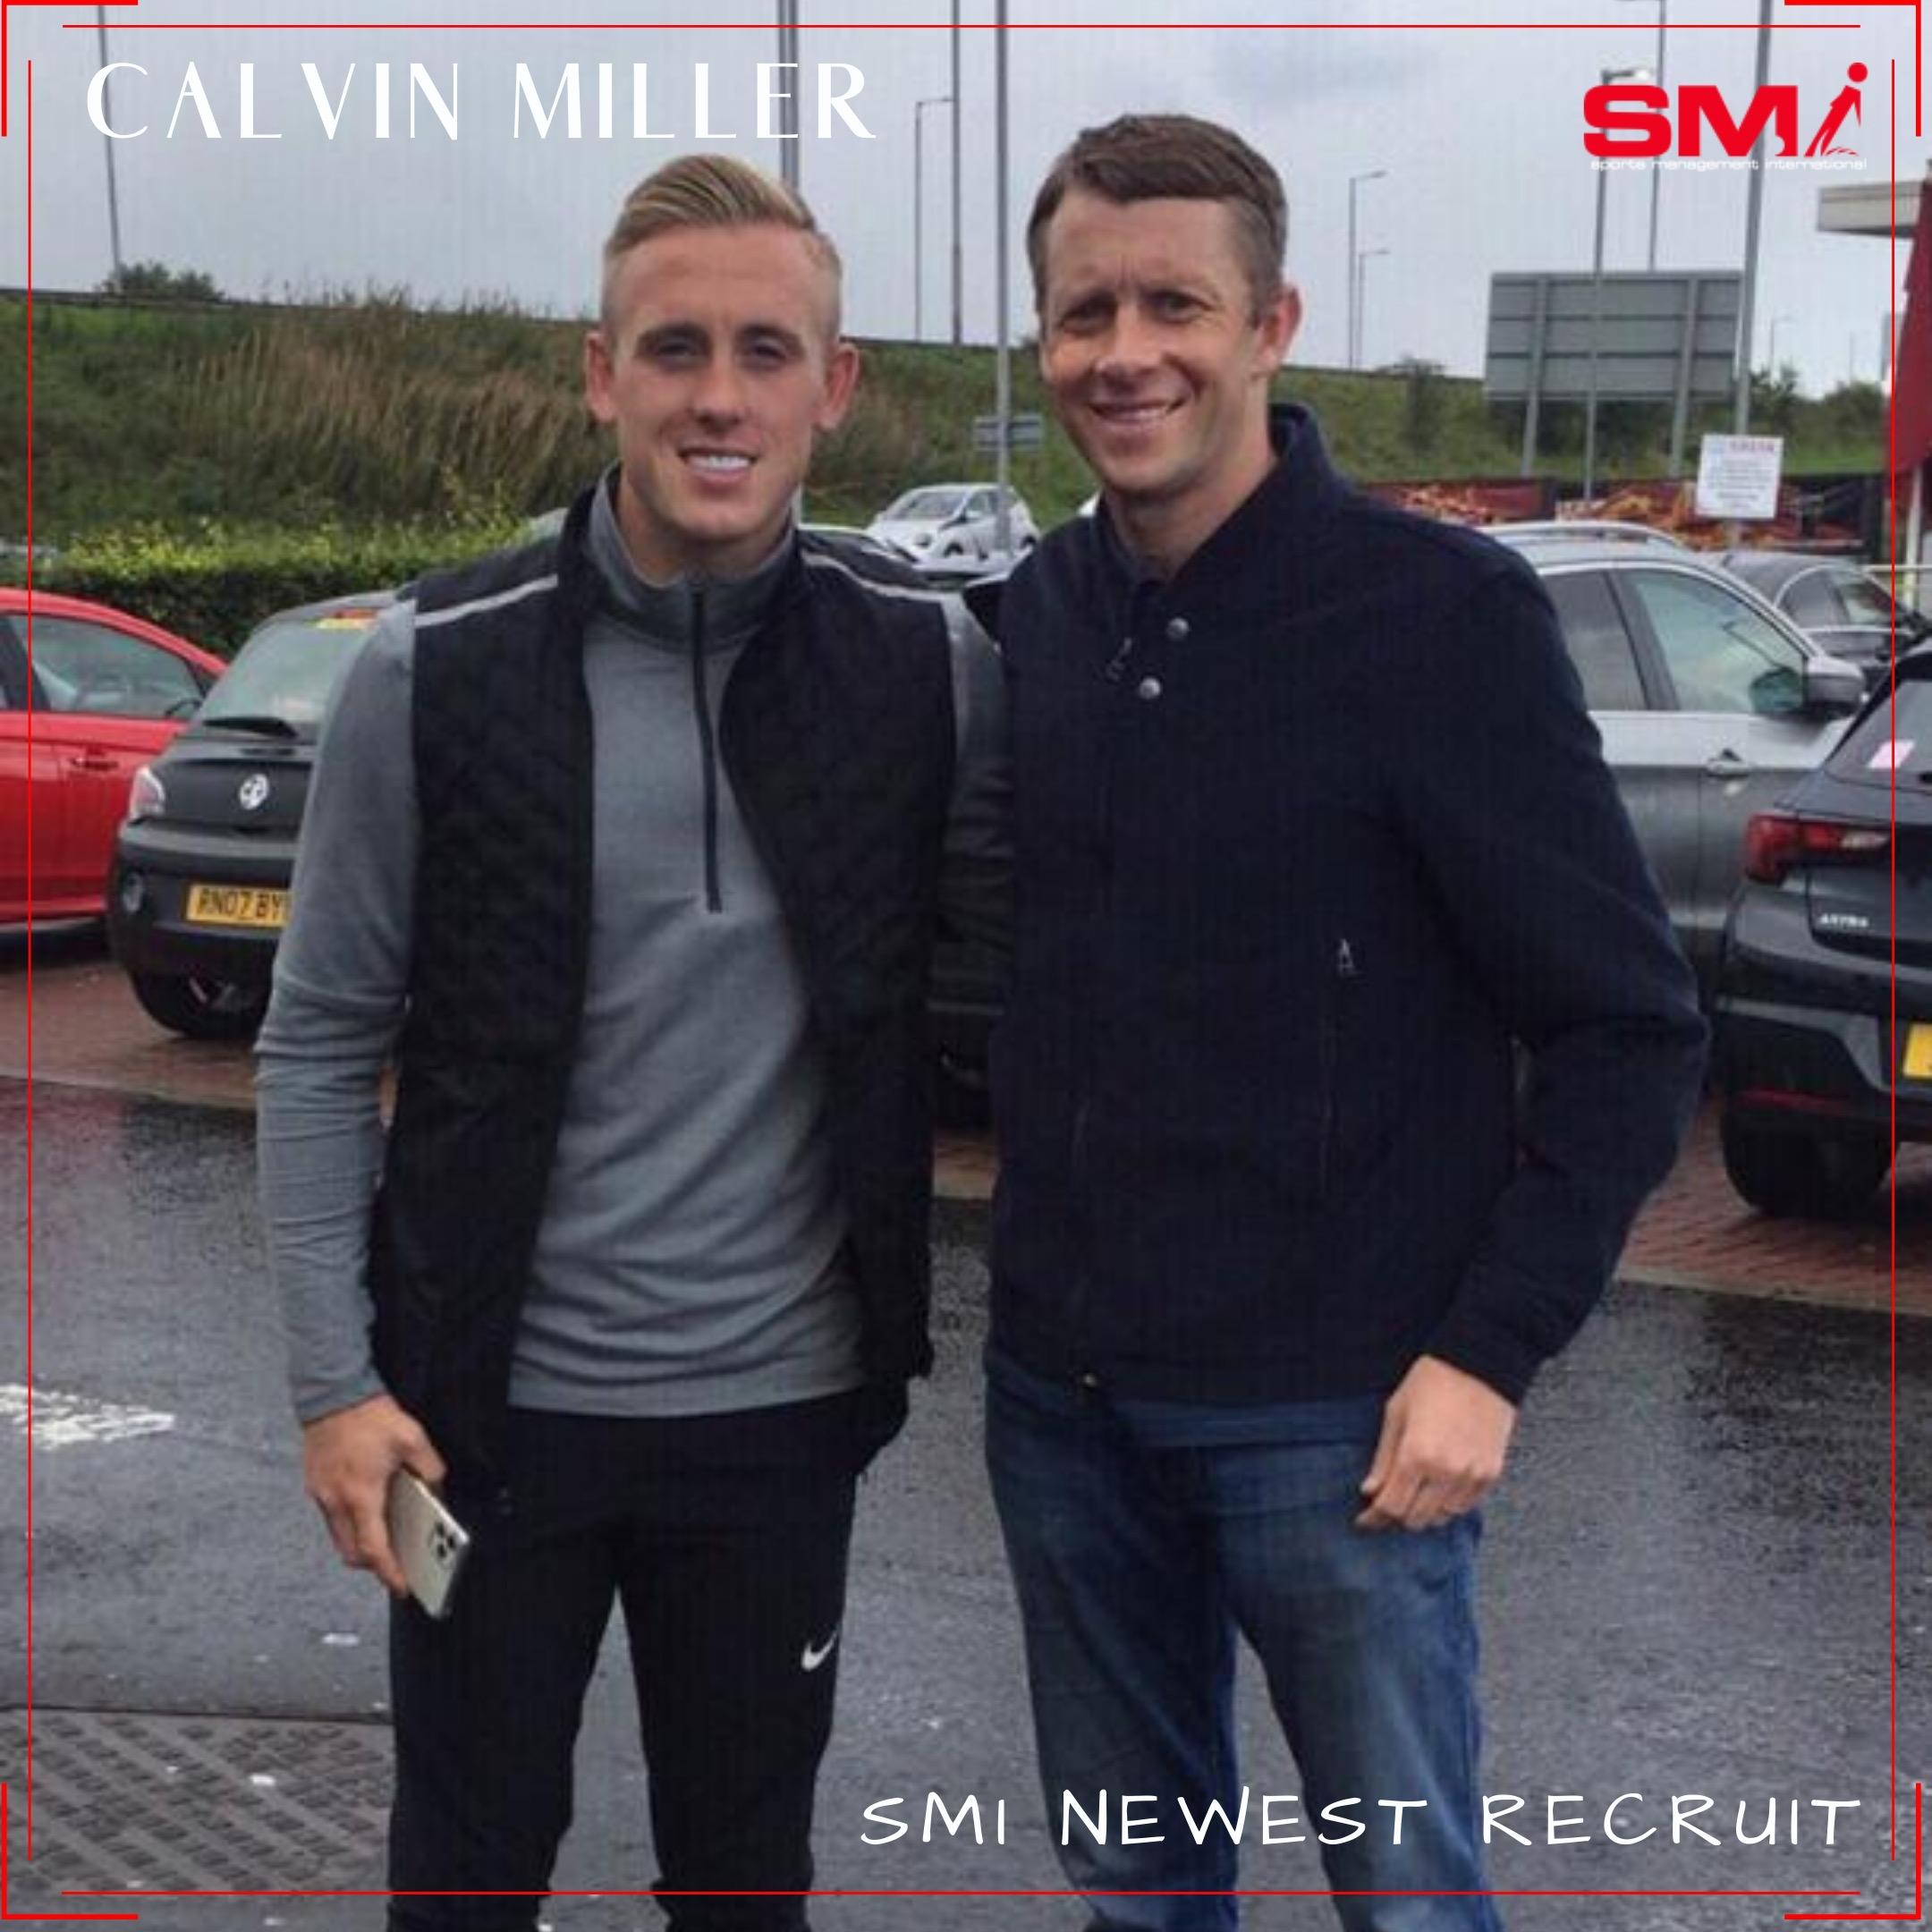 SMI Newest recruit Calvin Miller